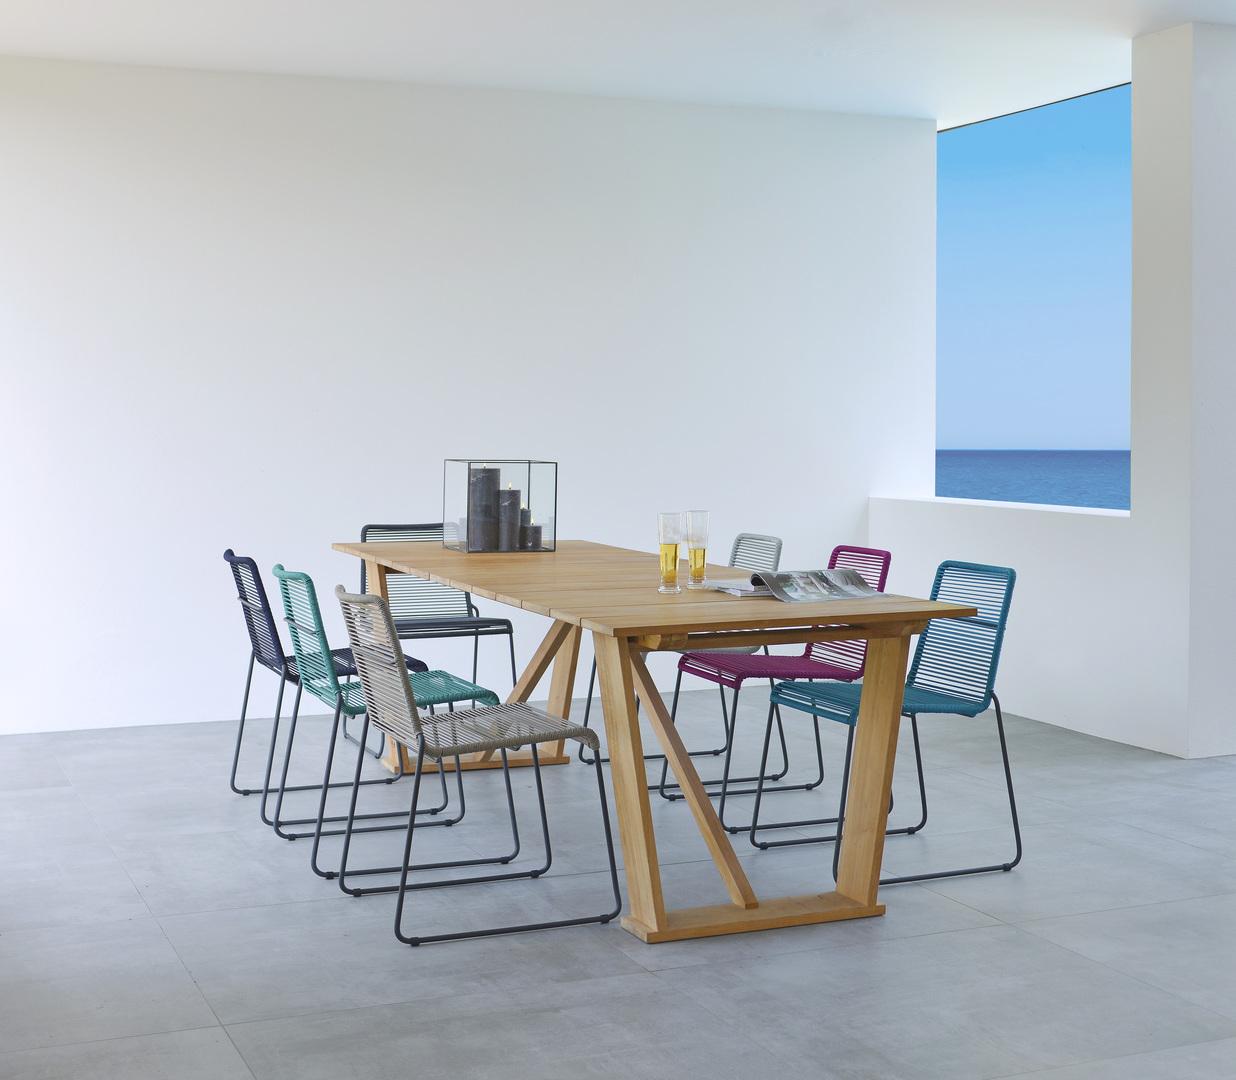 2017 Borek rope Sineu chair - teak Roma table-1.jpg